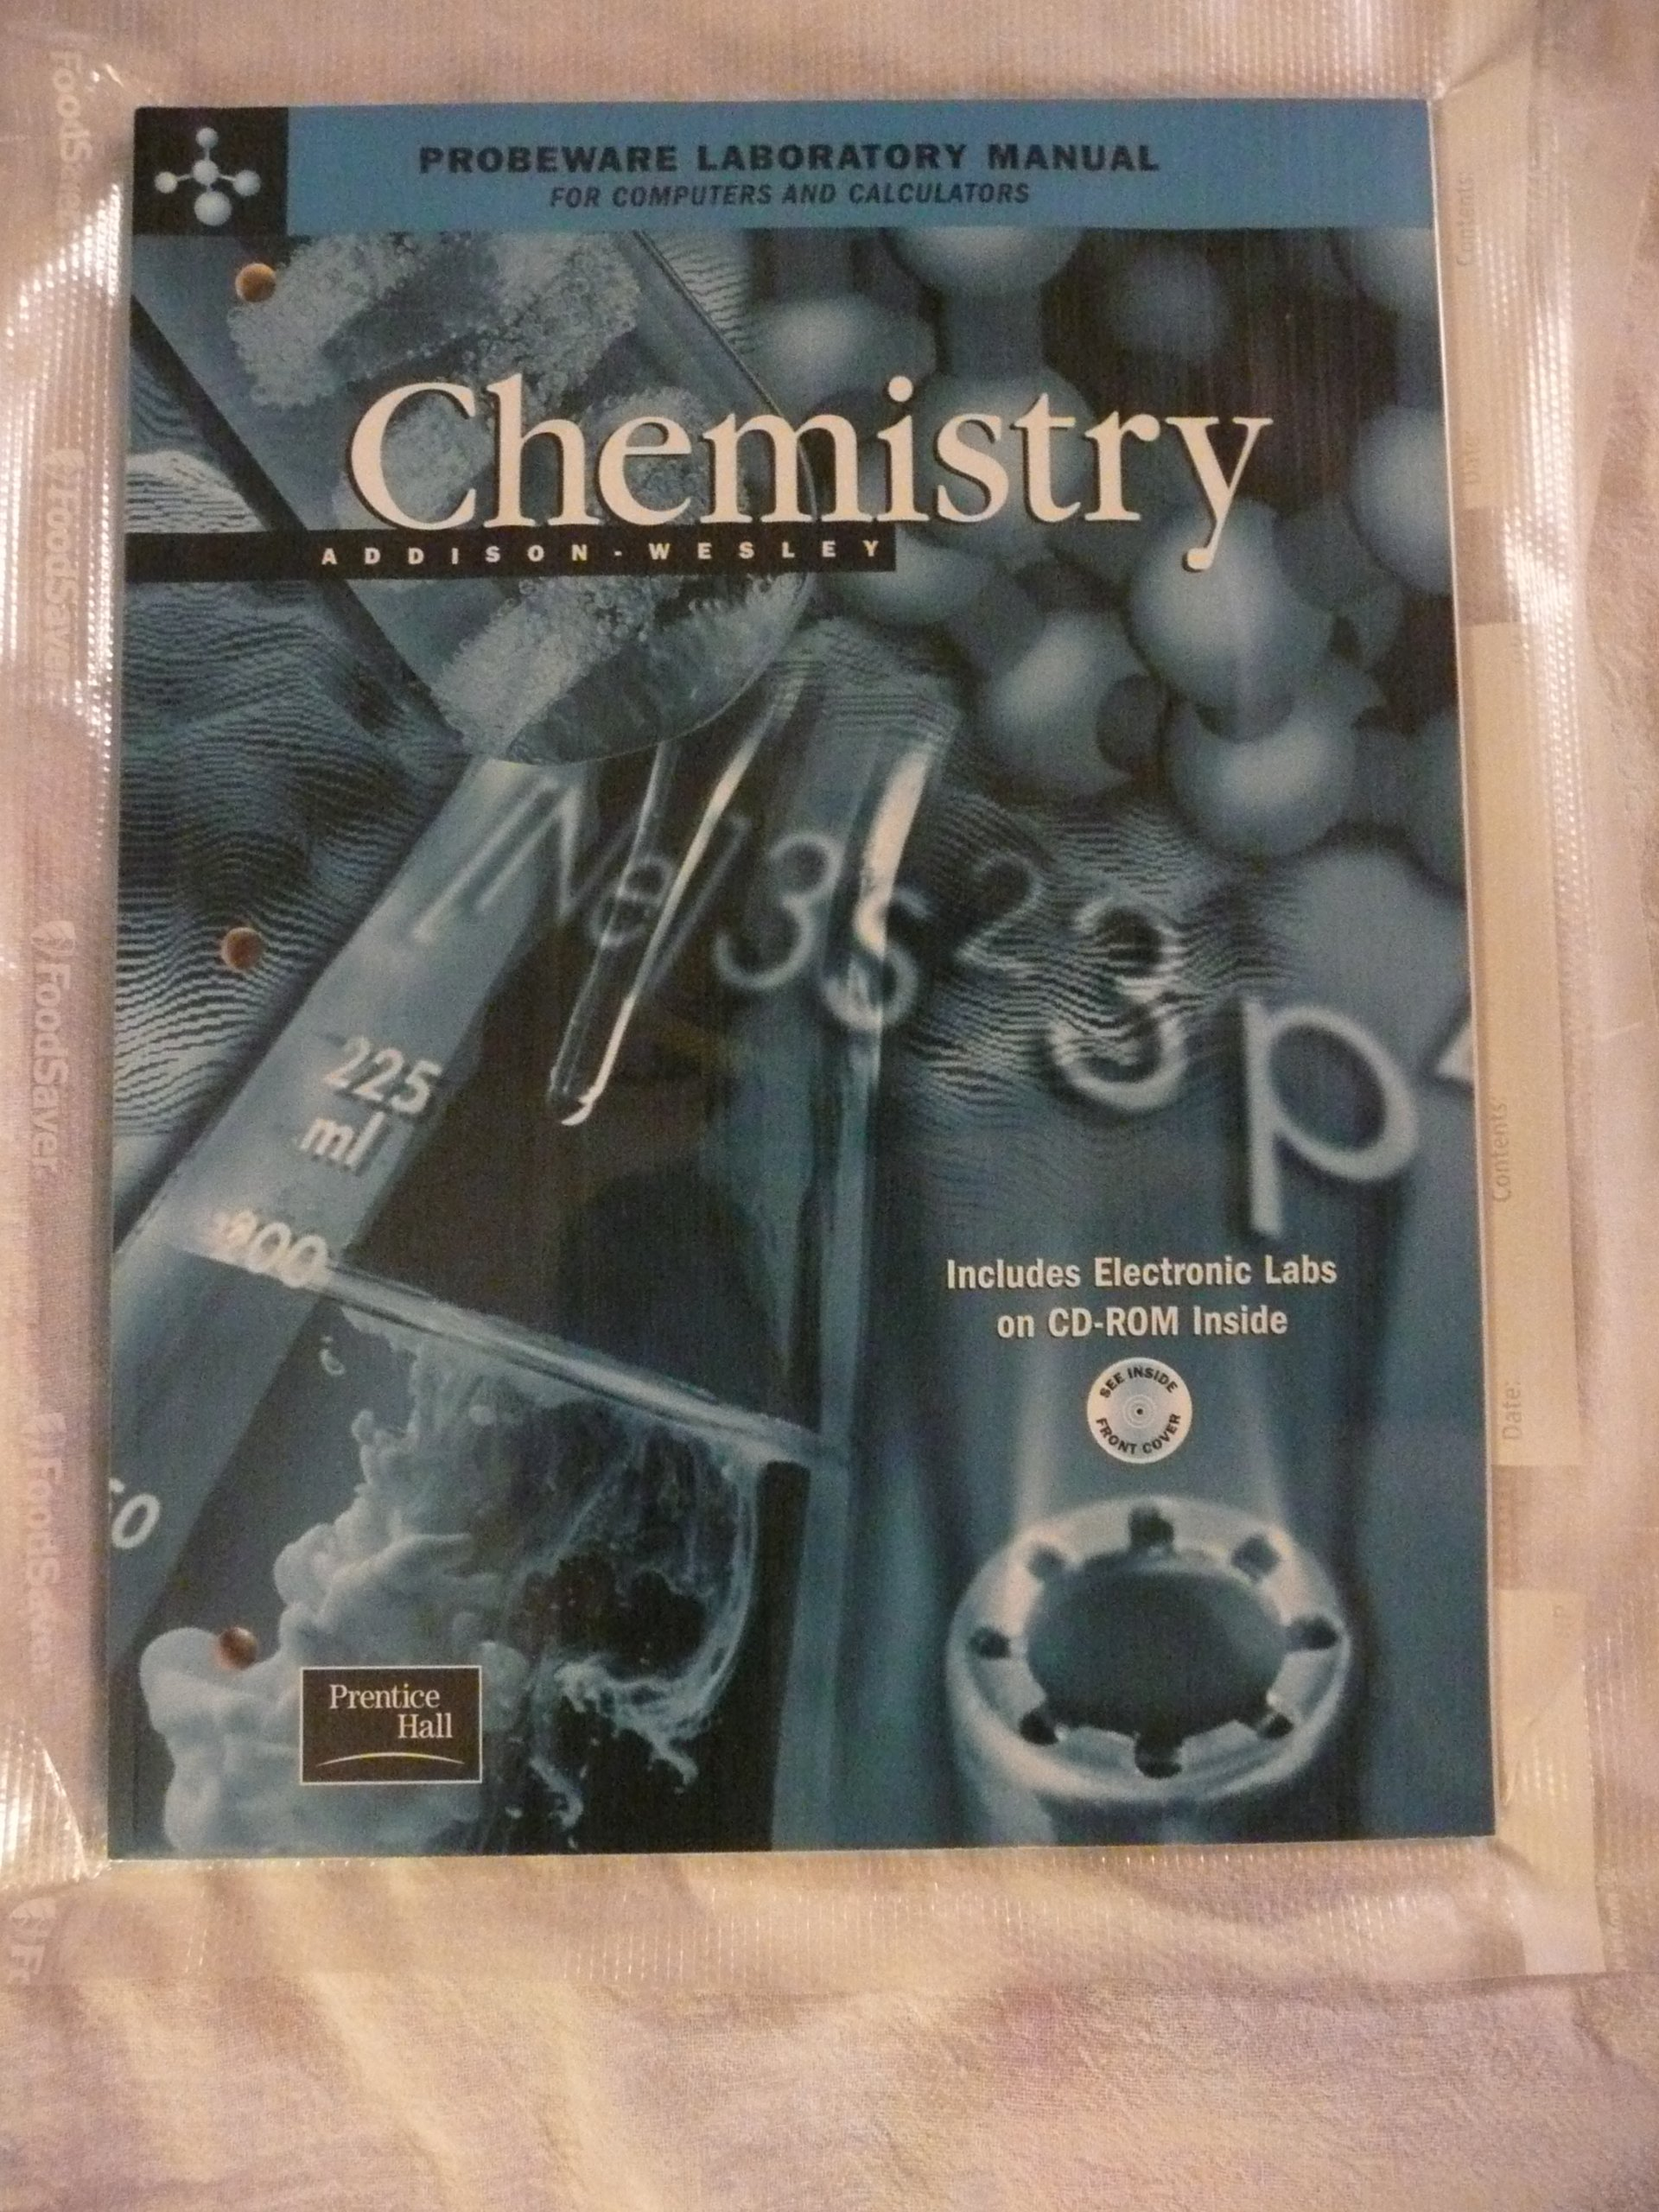 Addison Wesley Chemistry 5th Edition Probeware Lab Manual 2002c Paperback –  Feb 1 2001